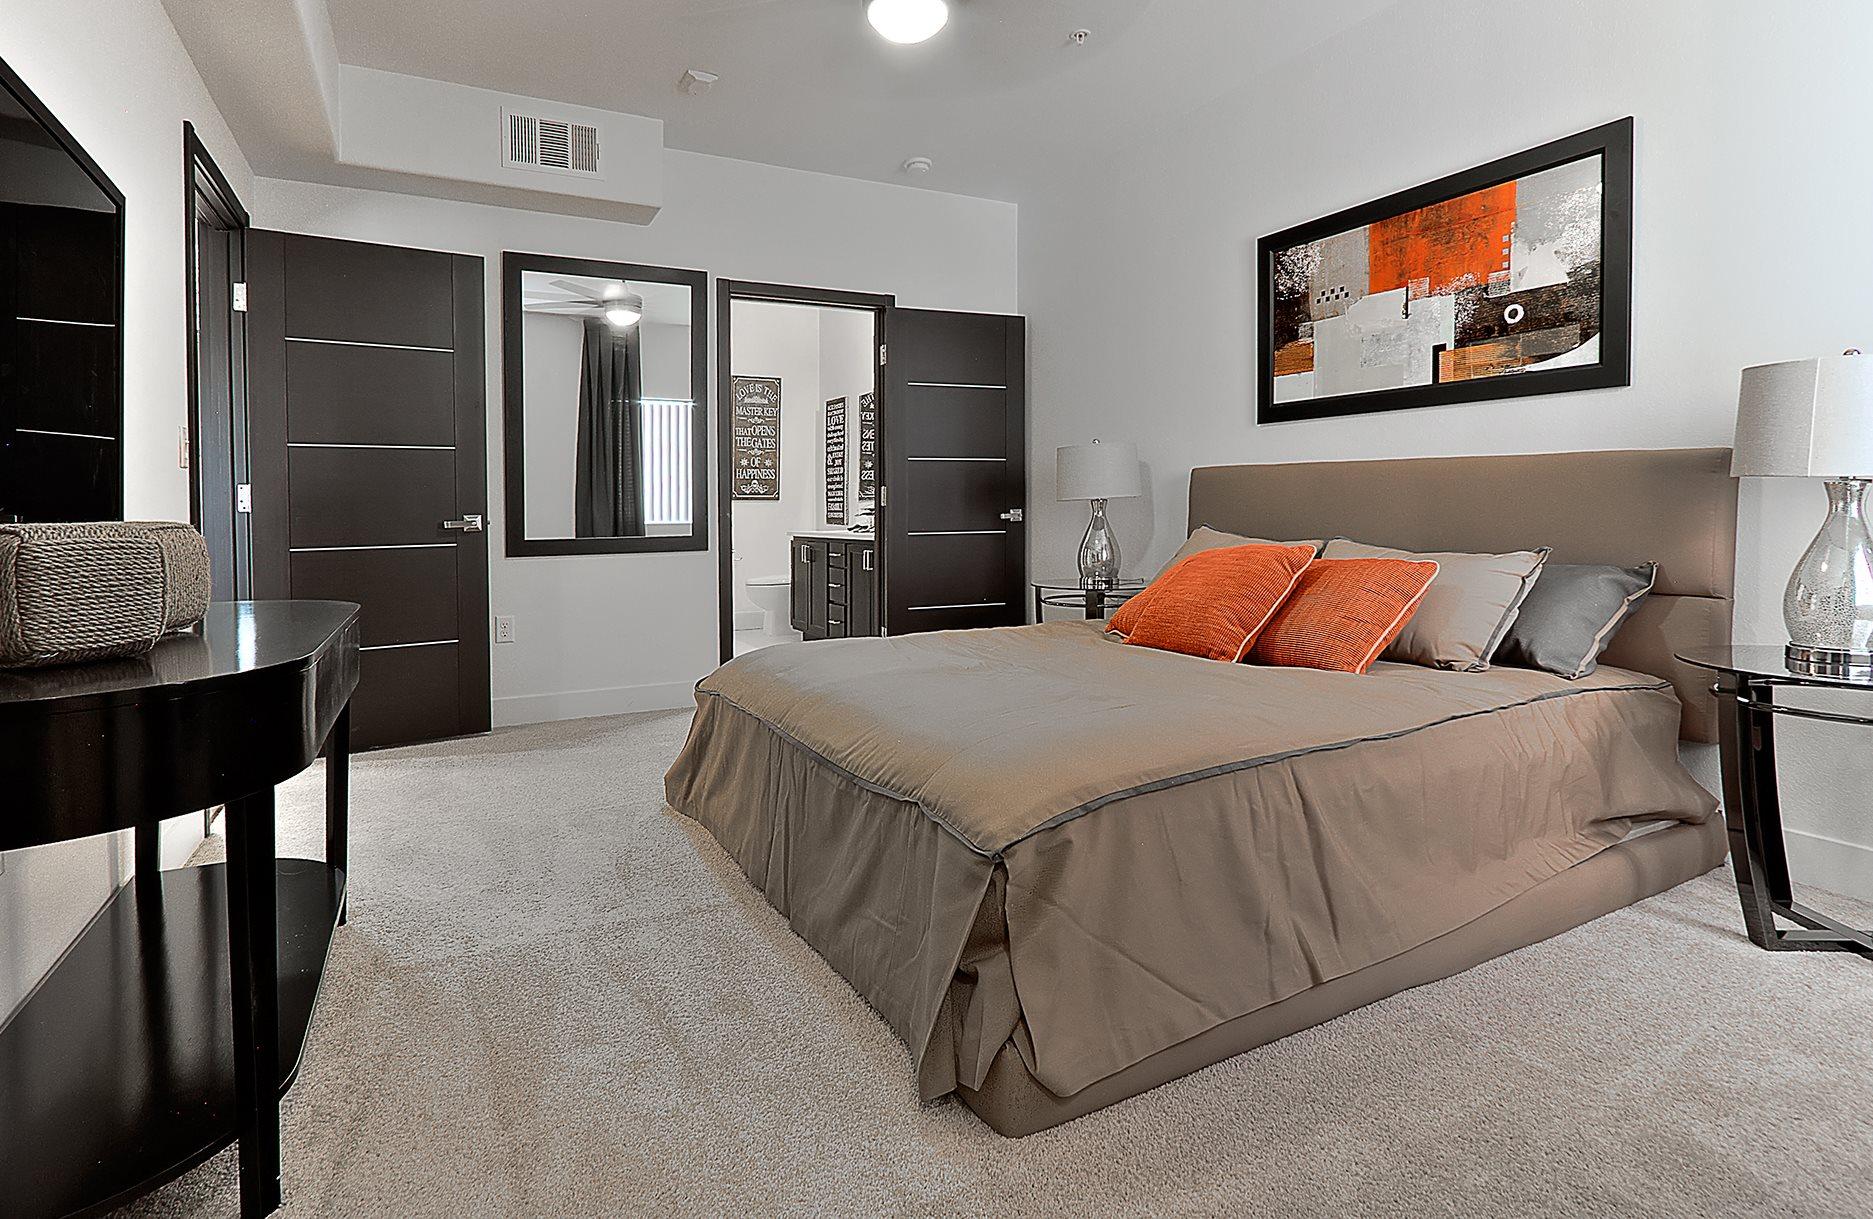 The Wyatt | Apartments in Las Vegas, NV